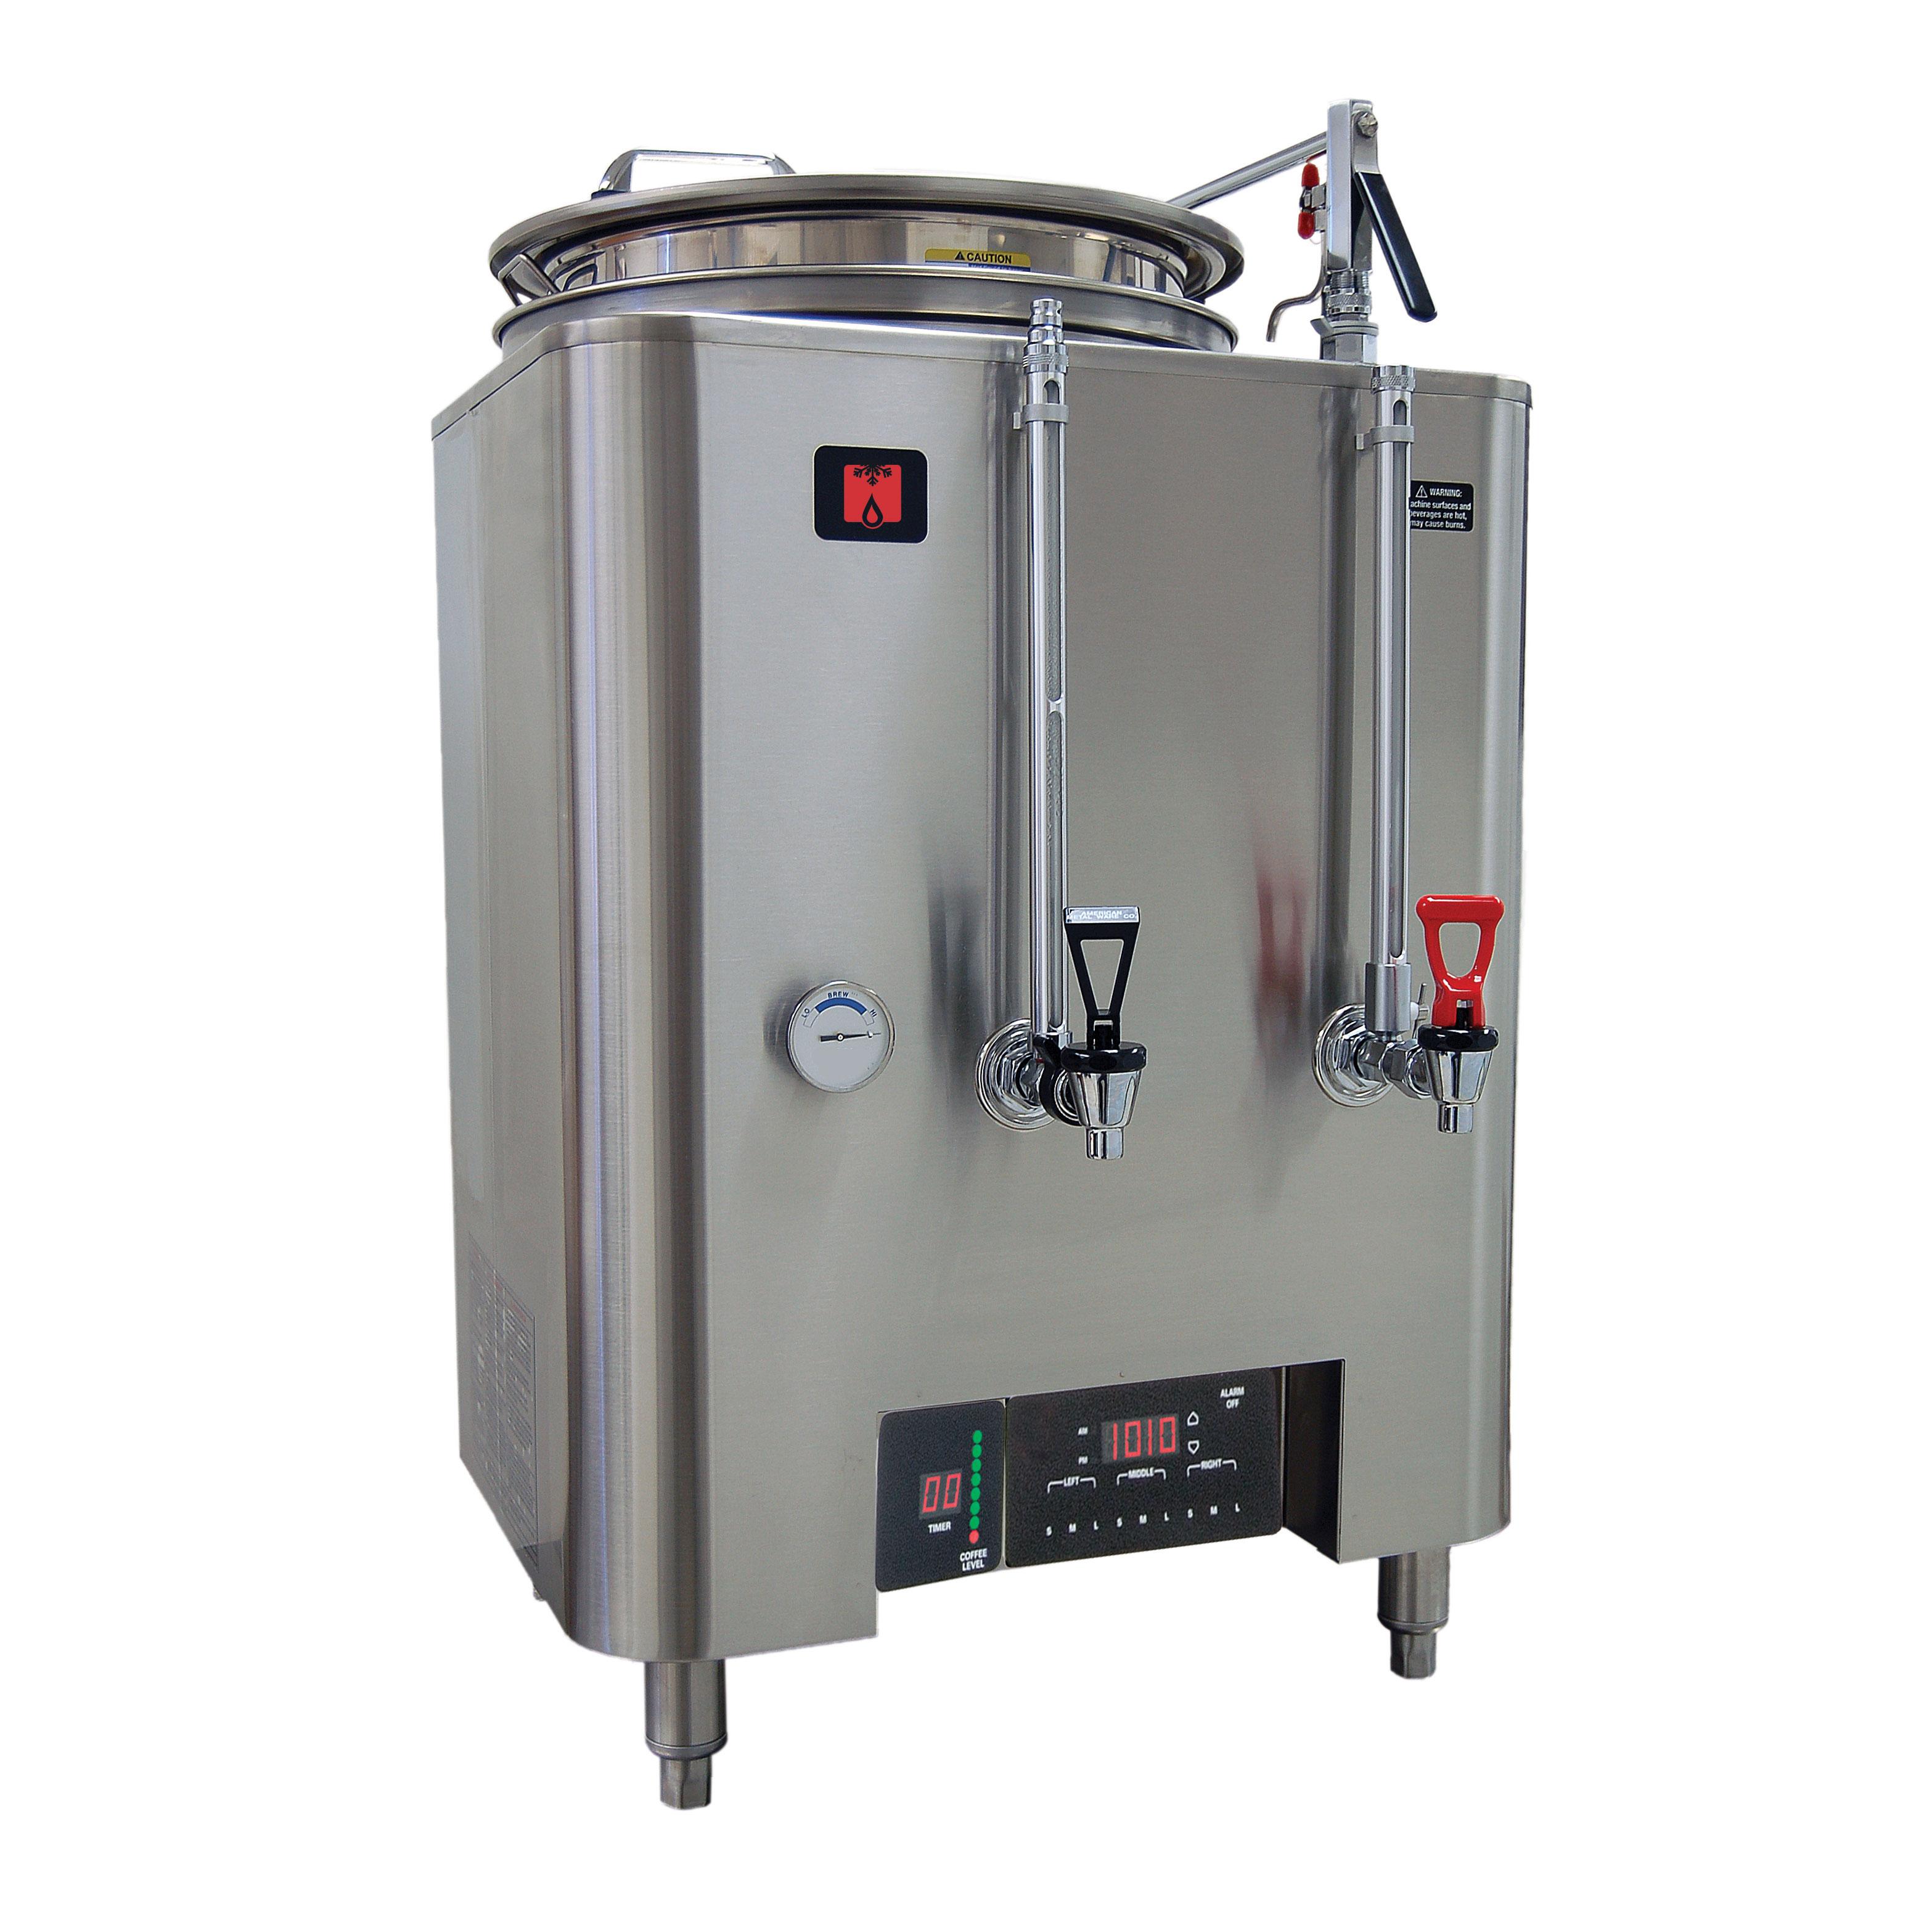 Grindmaster-Cecilware PB-8103E coffee brewer urn, high volume